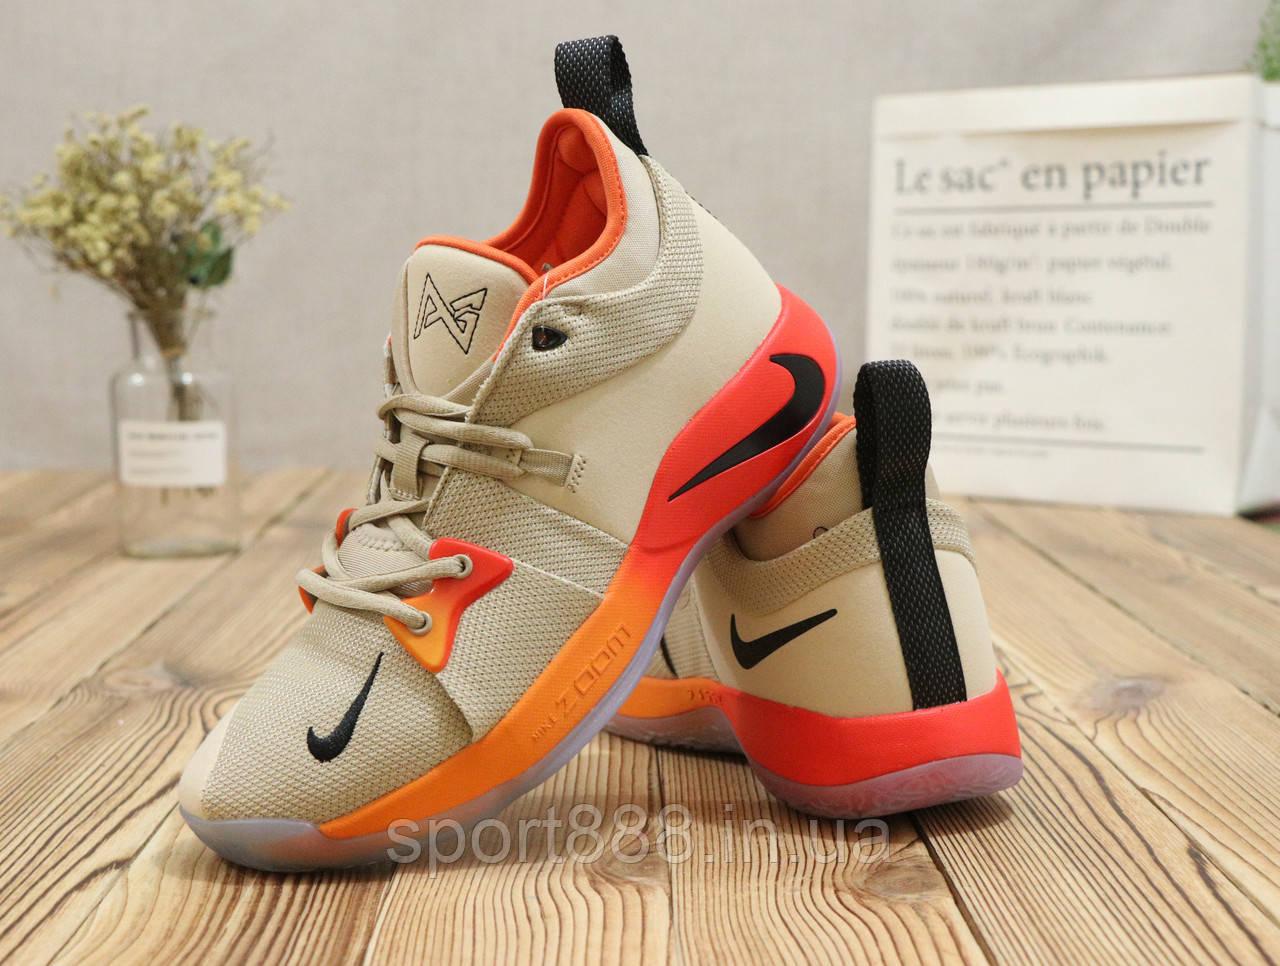 pretty nice 1c330 25ee7 Nike PG 2 All-Star PE мужские кроссовки: продажа, цена в Николаеве. обувь  для баскетбола от